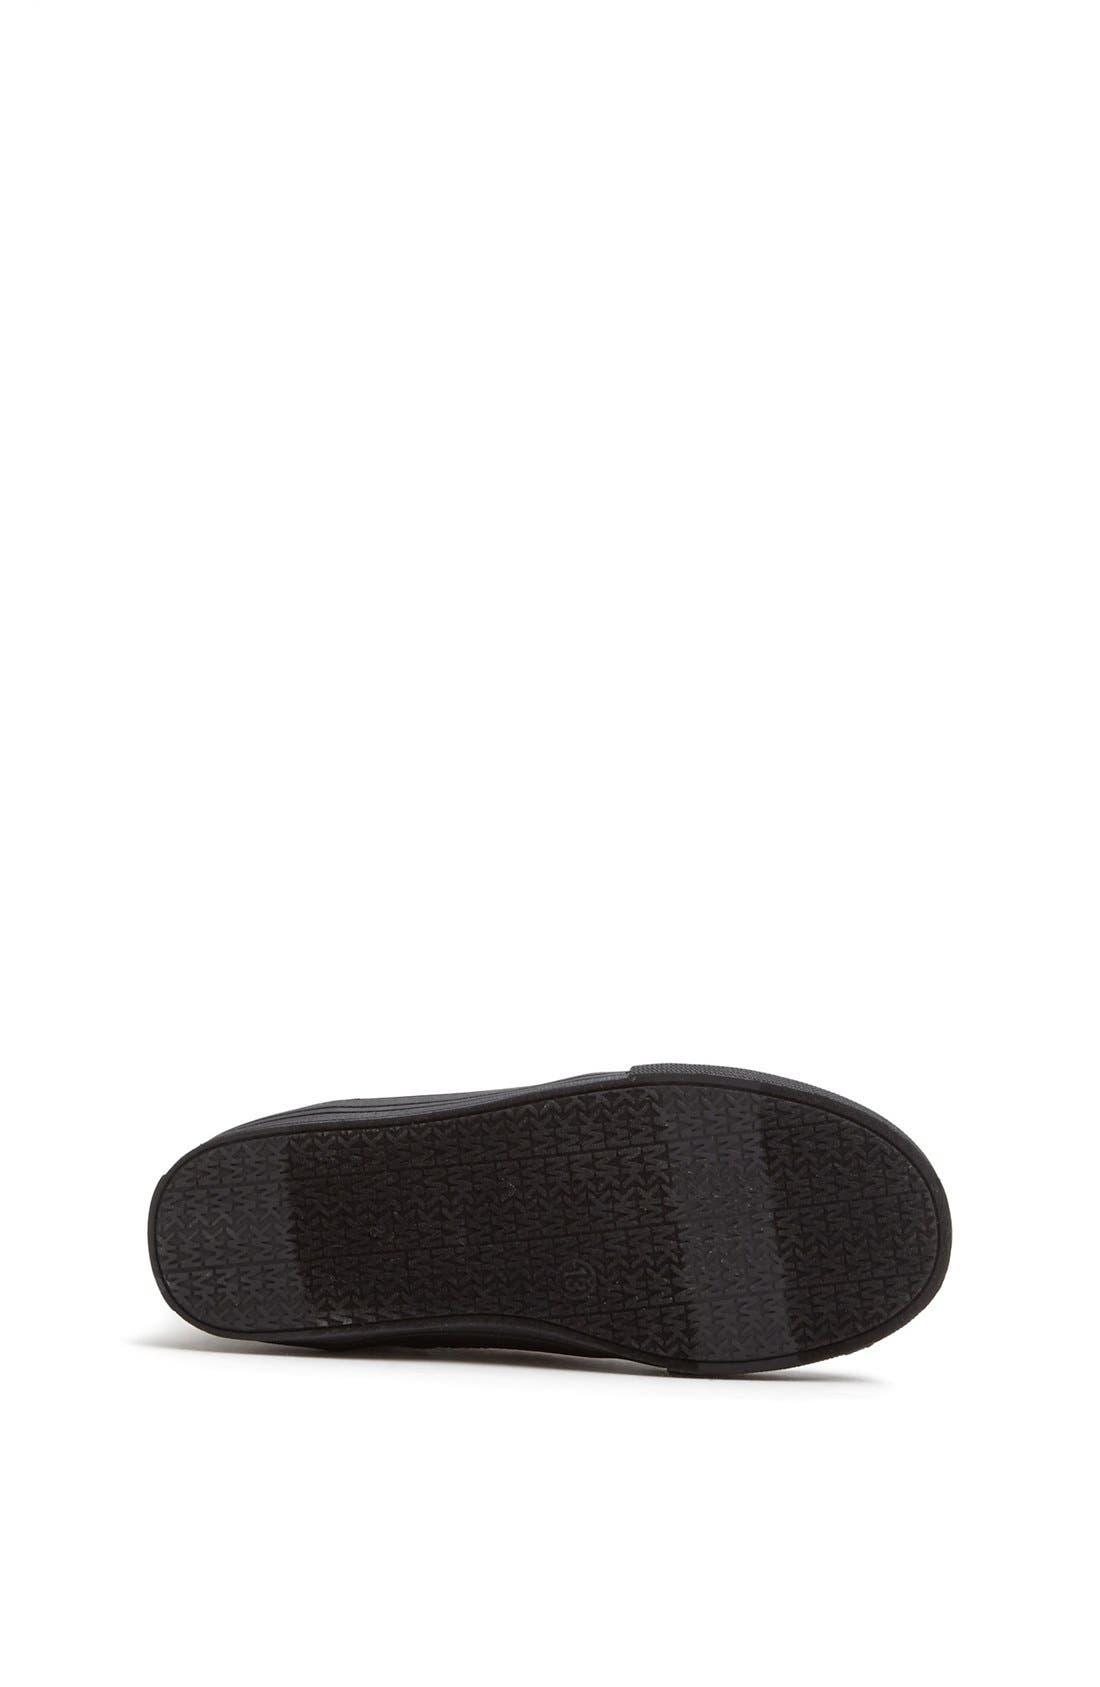 Alternate Image 4  - MICHAEL Michael Kors 'Ivy' High Top Sneaker (Walker, Toddler, Little Kid & Big Kid)